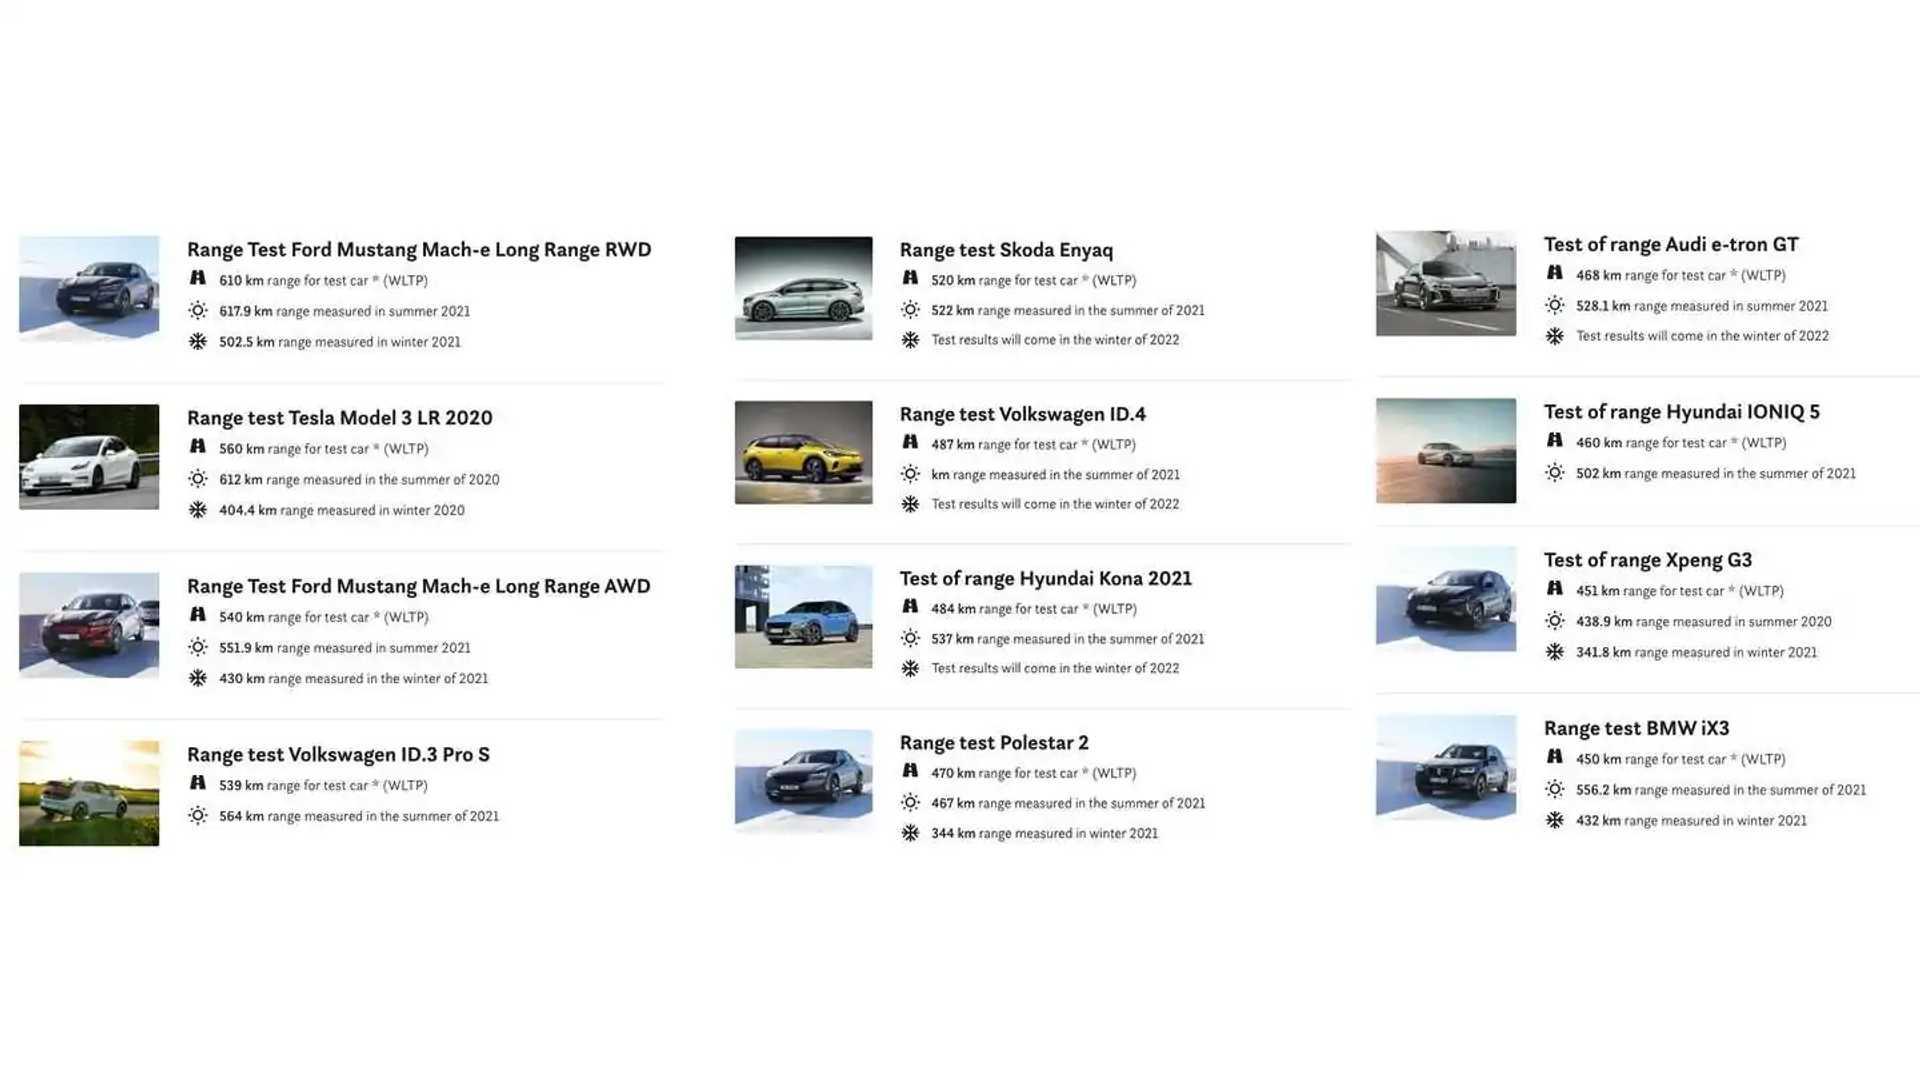 https://cdn.motor1.com/images/mgl/9qlB0/s6/naf-summer-electric-vehicle-range-test.jpg